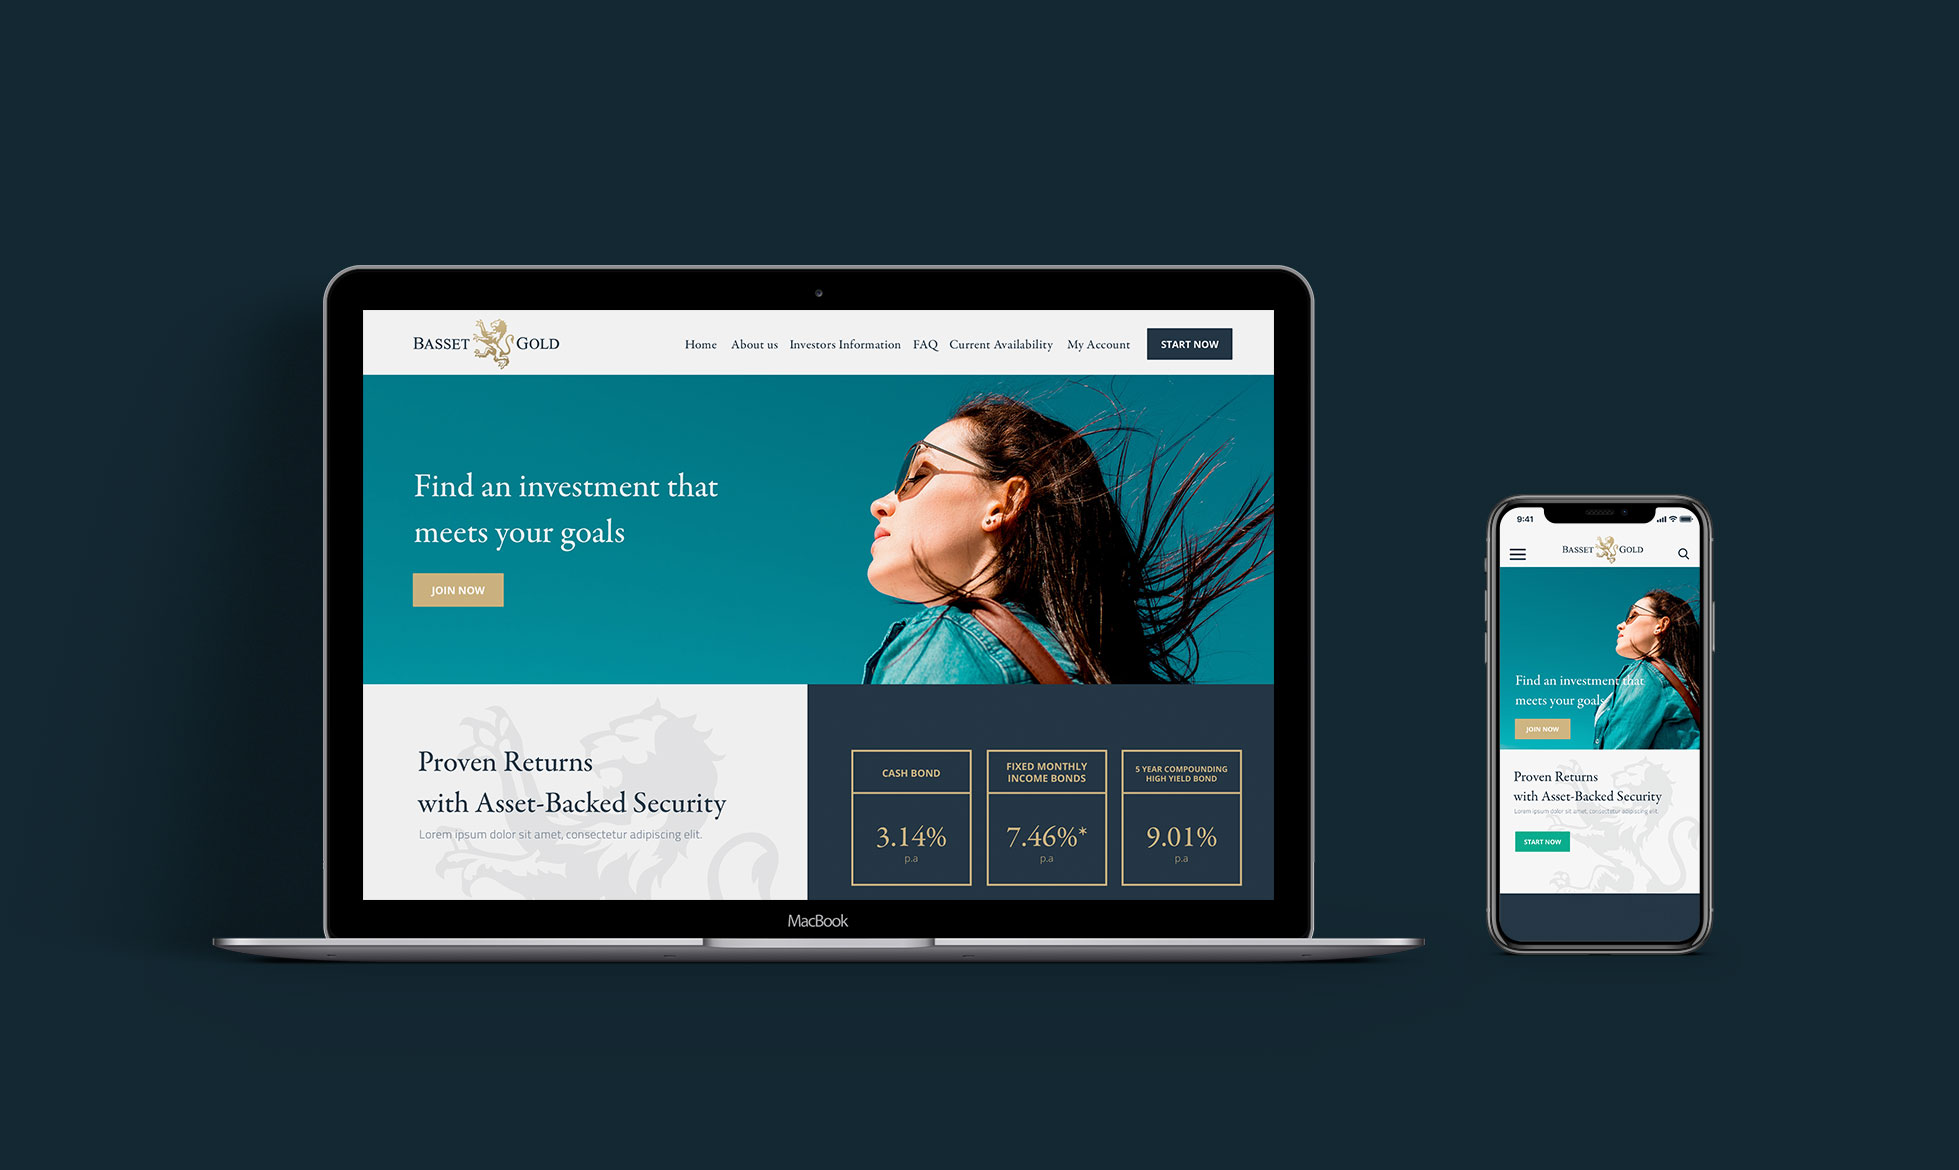 bassetgold-website-redesign-london.jpg